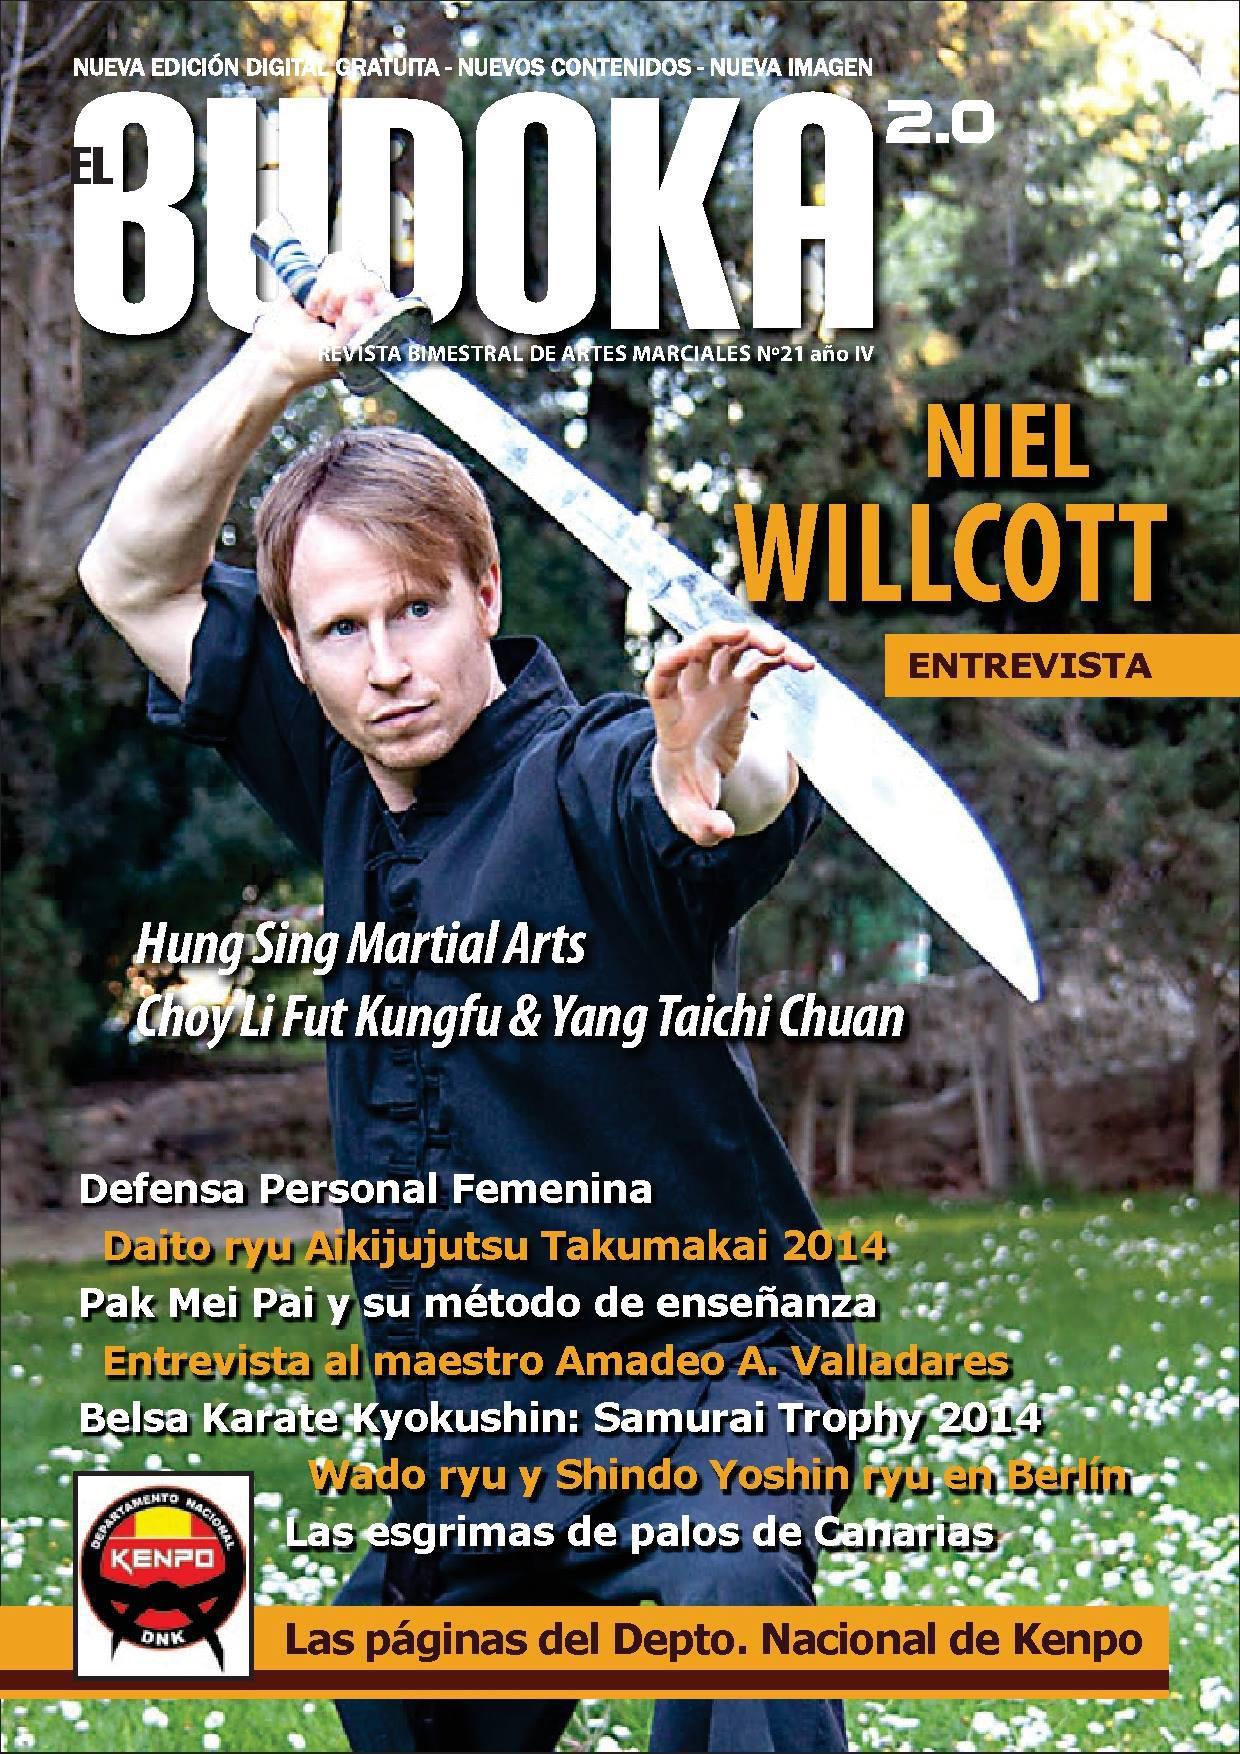 el budoka Niel willcott choy li fut kung fu .jpg